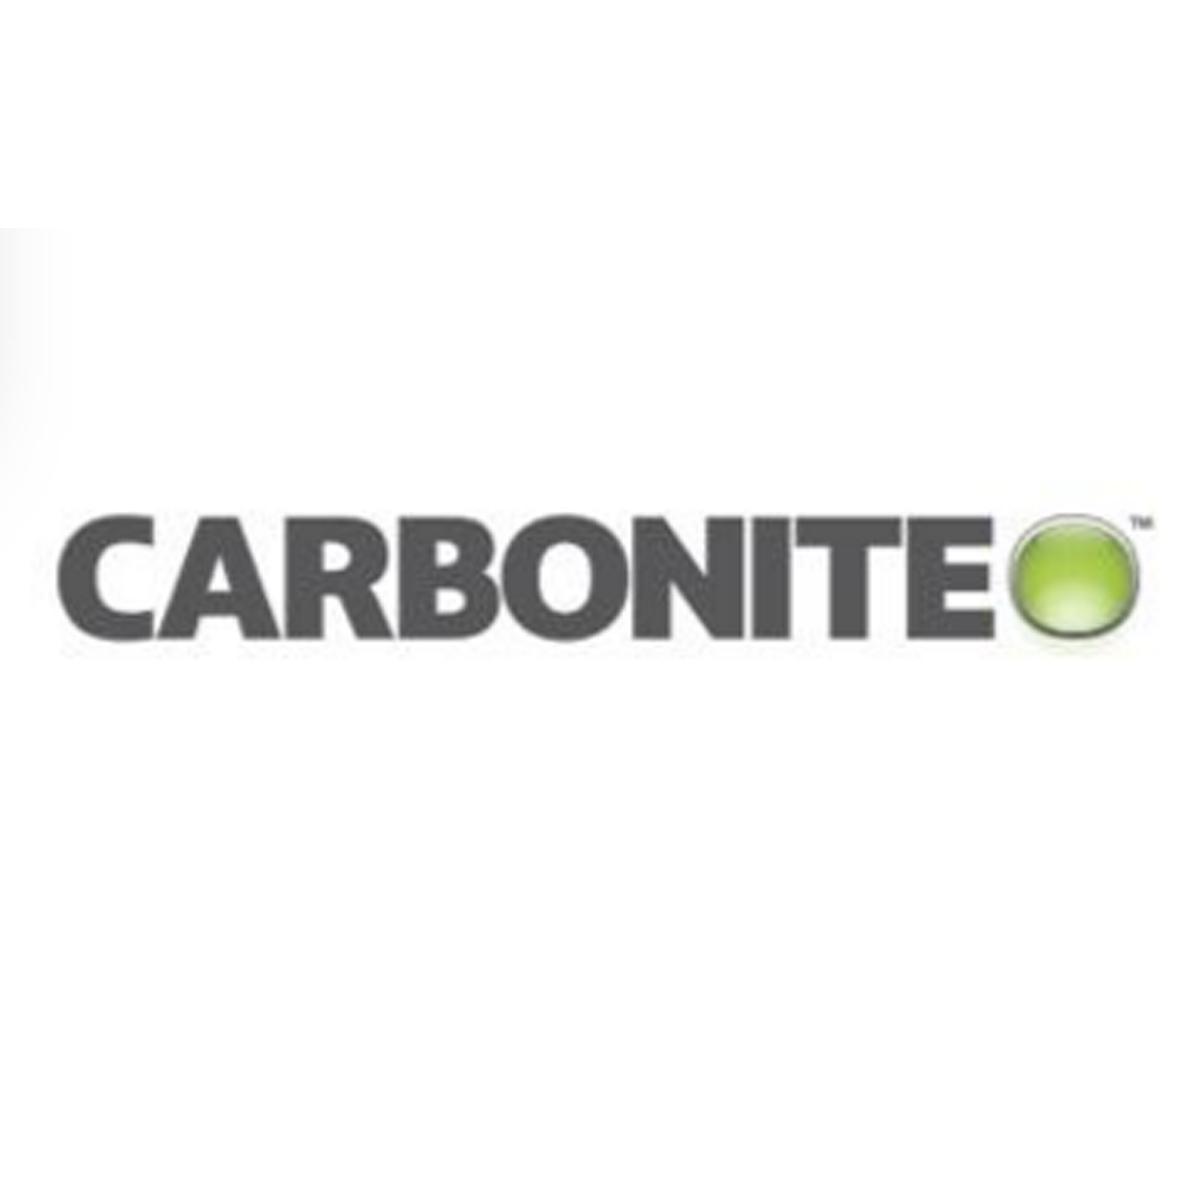 CArbonite Sq.jpg